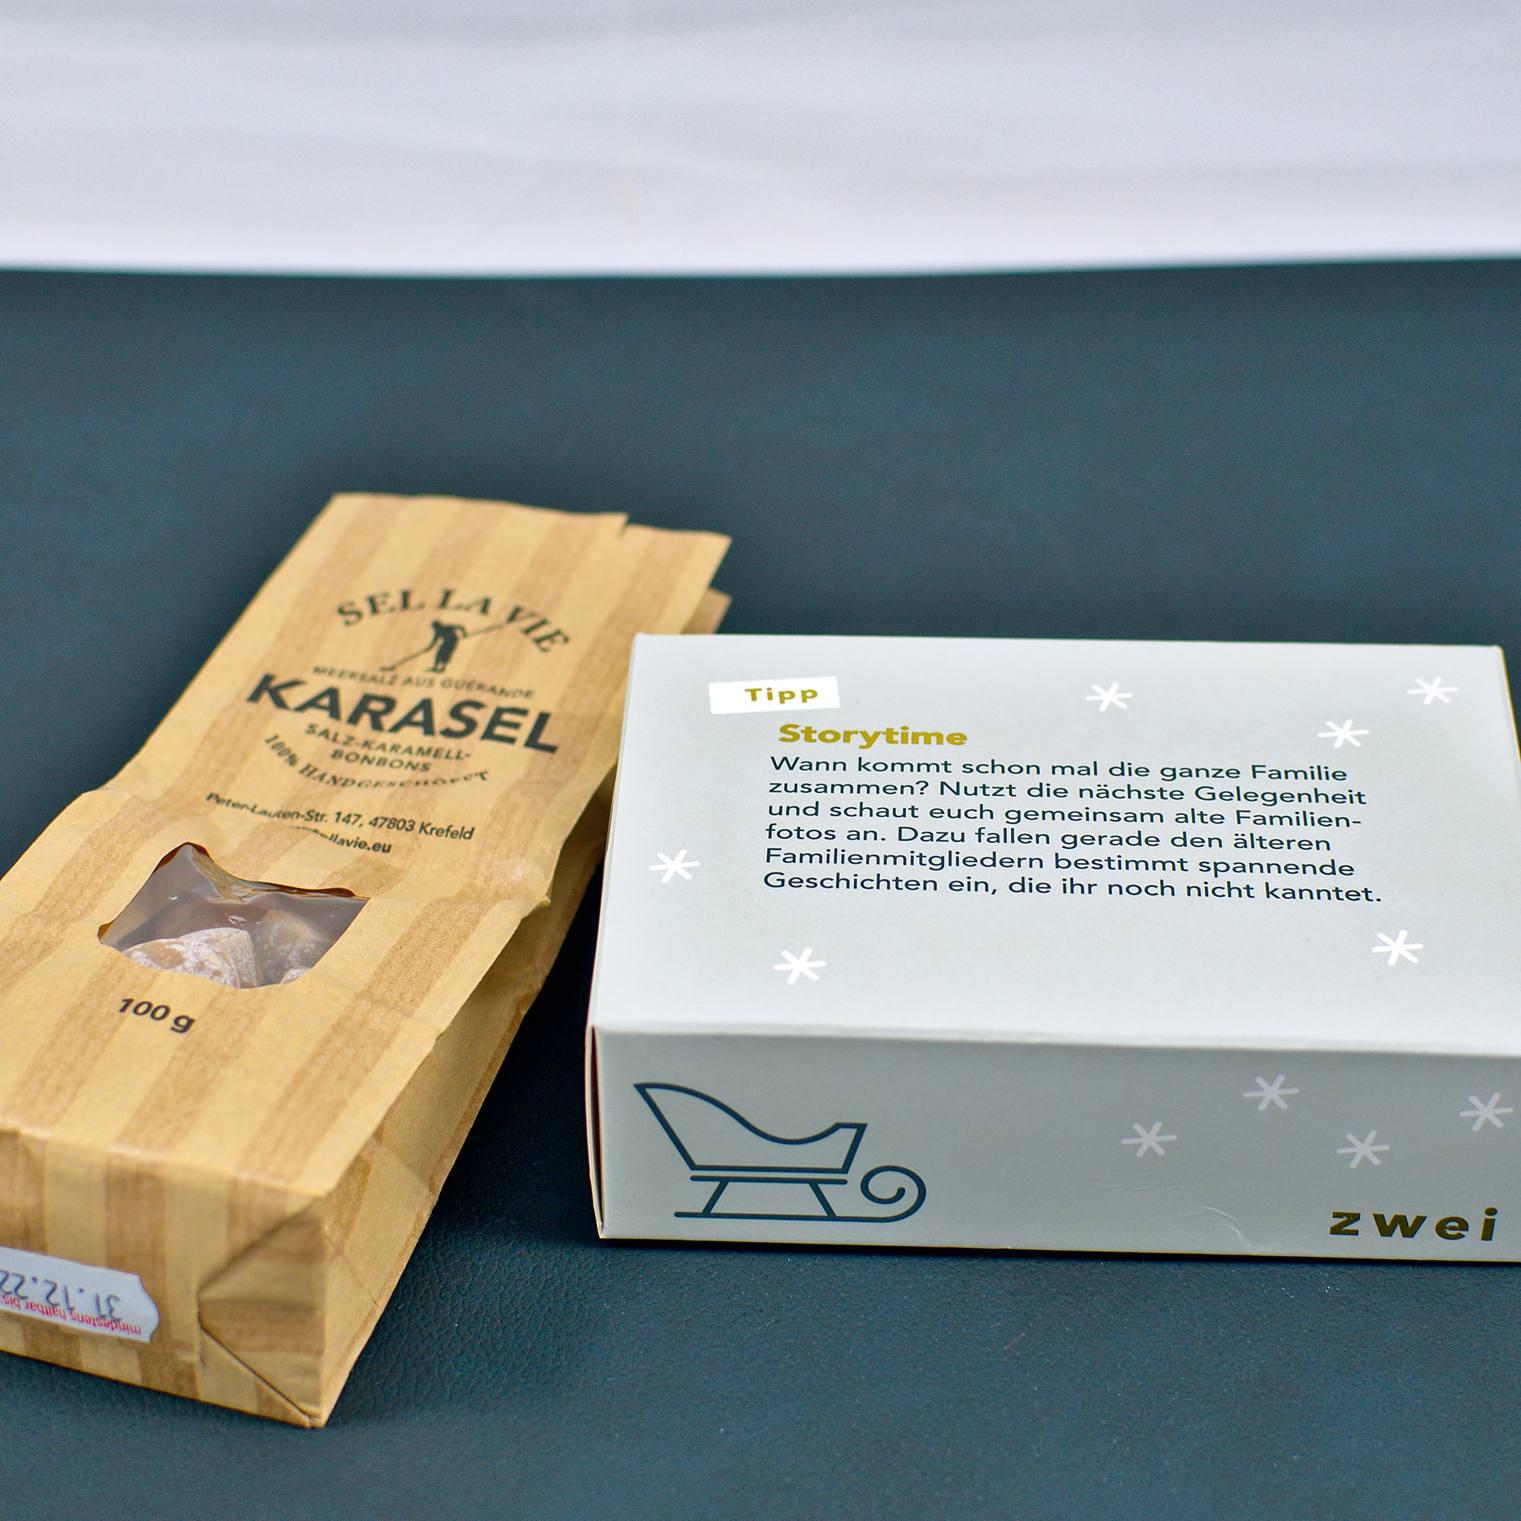 KaraSel – Salz Karamell Bonbons von Sel La Vie   2. Türchen